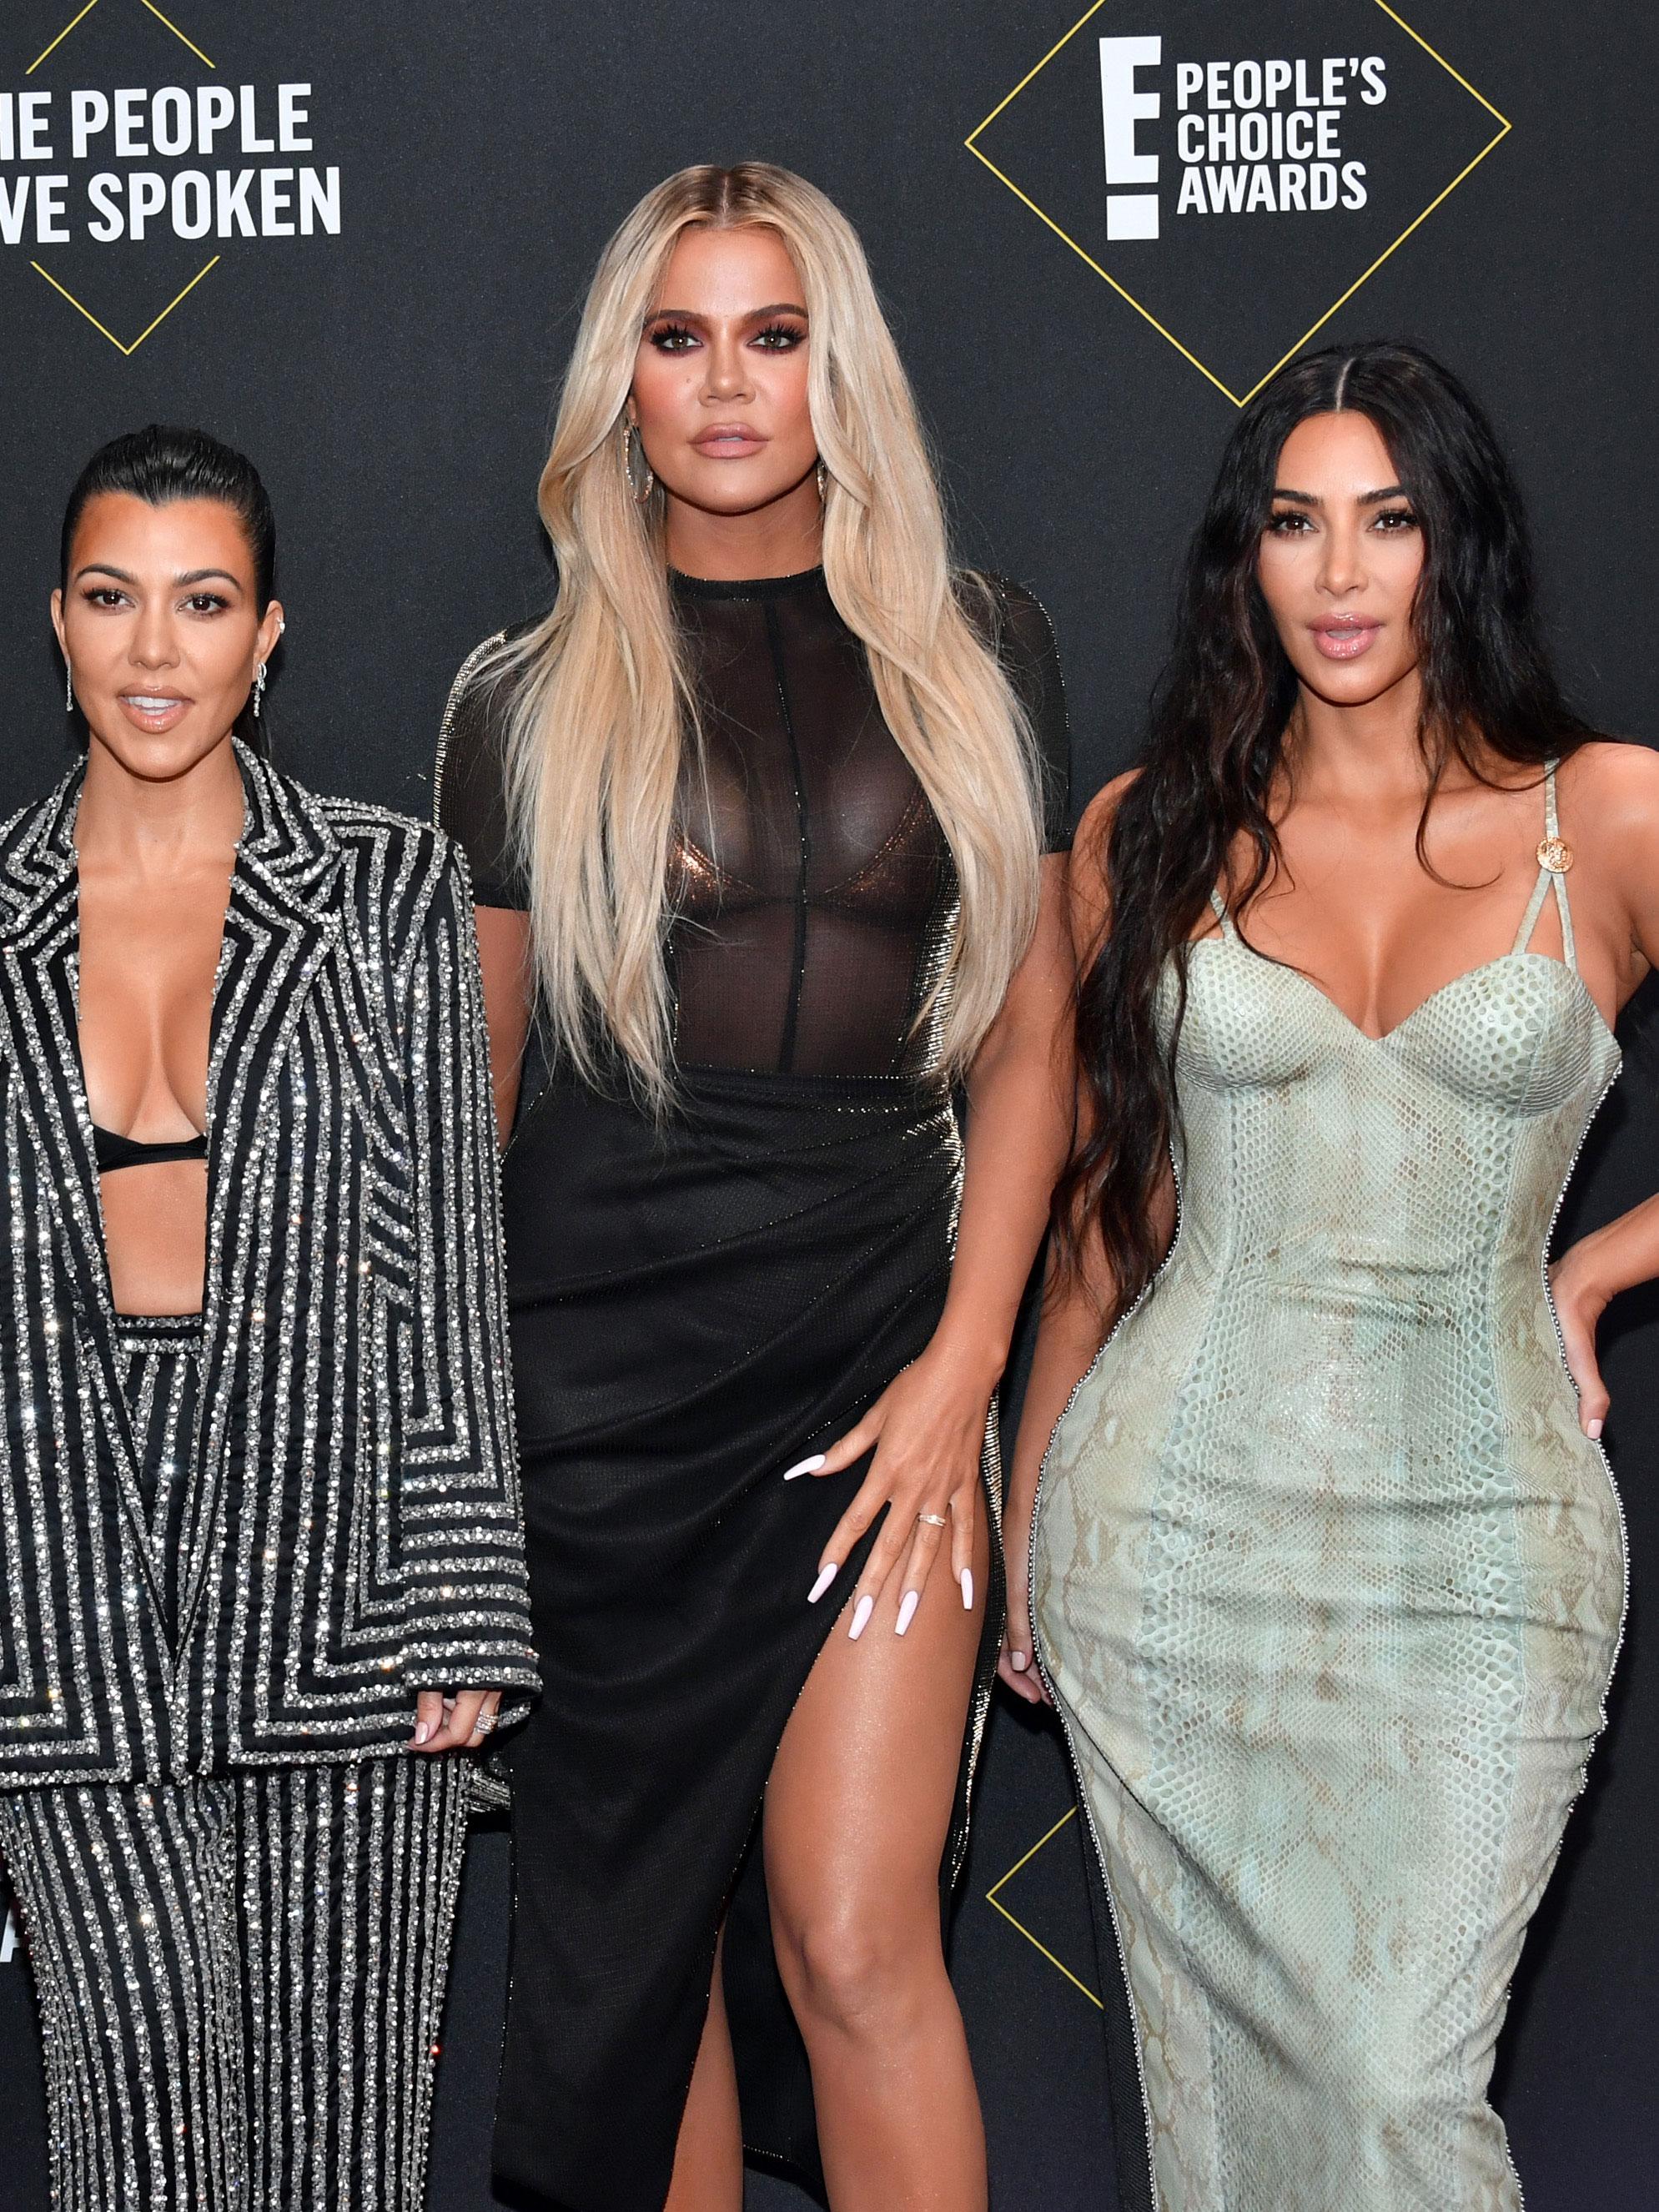 Khloe Kardashian catches sister Kourtney out in 'craziest lie'